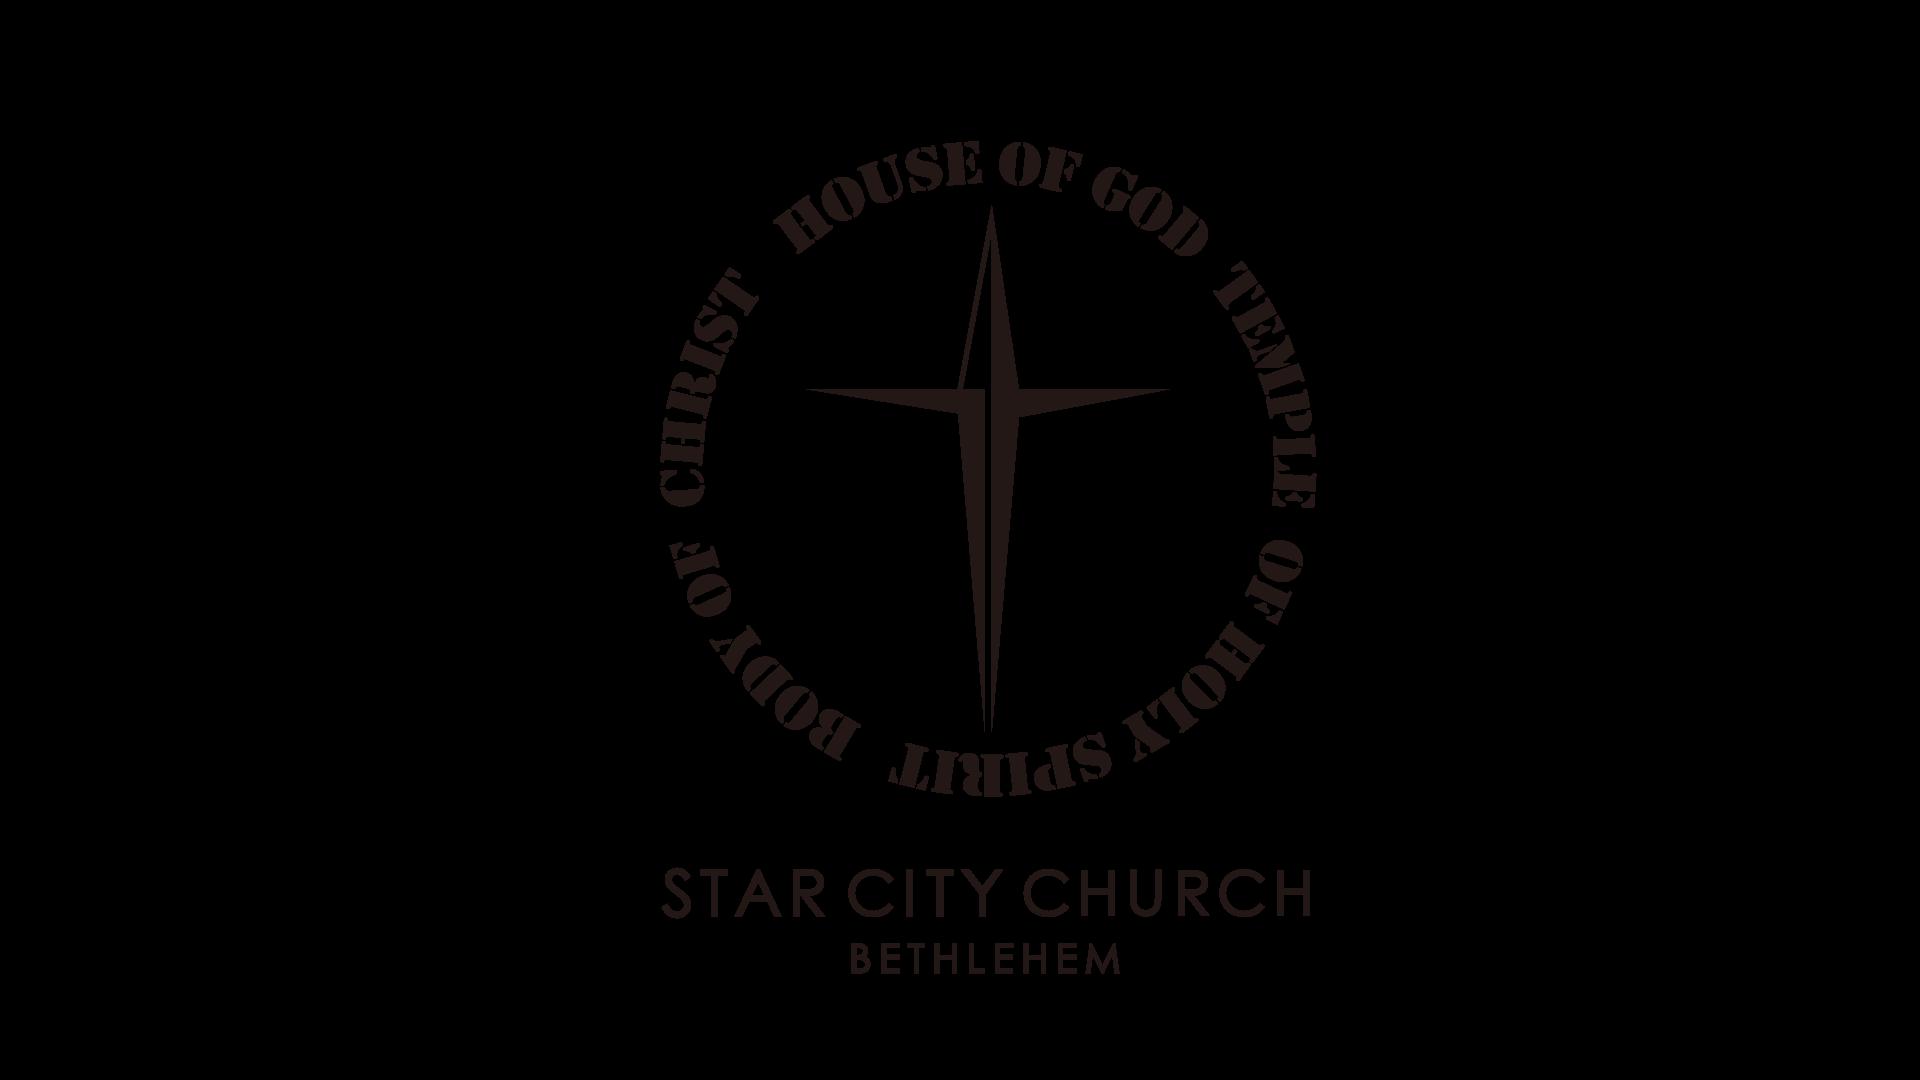 Star City Church logo_黑